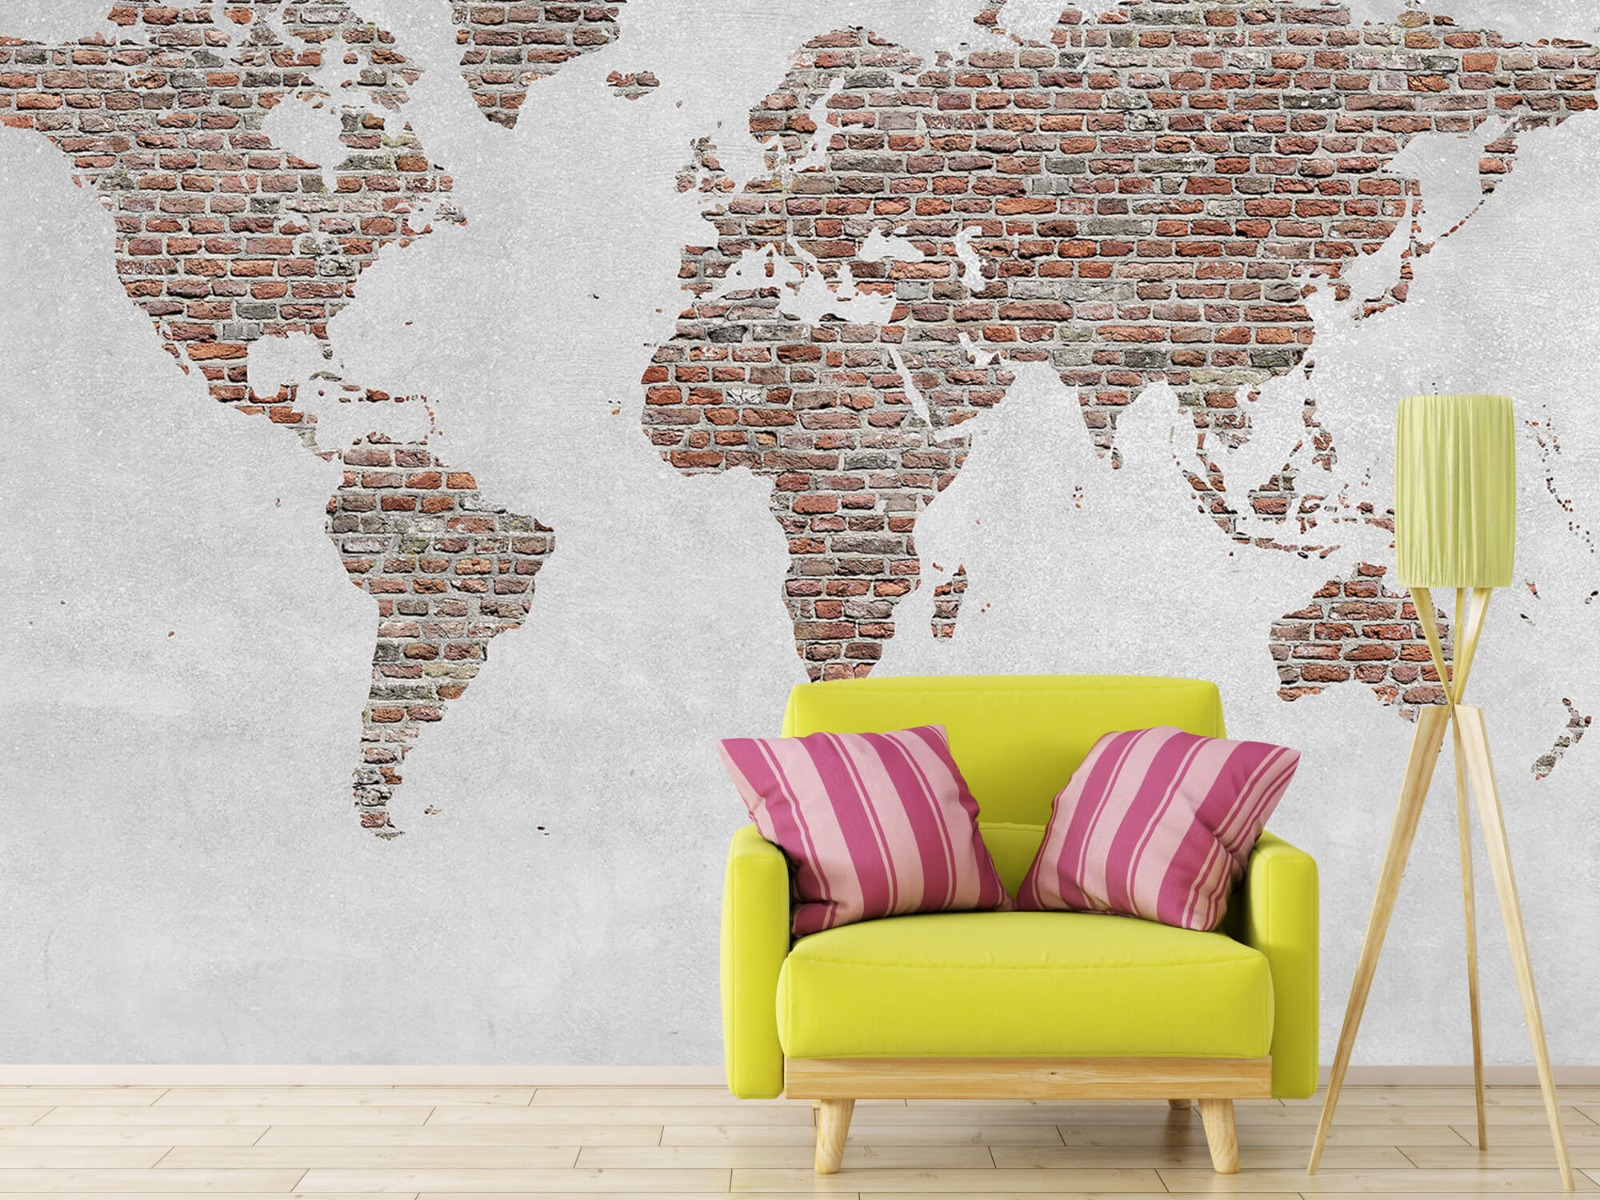 Steen behang - Wereldkaart stenen - Slaapkamer 17